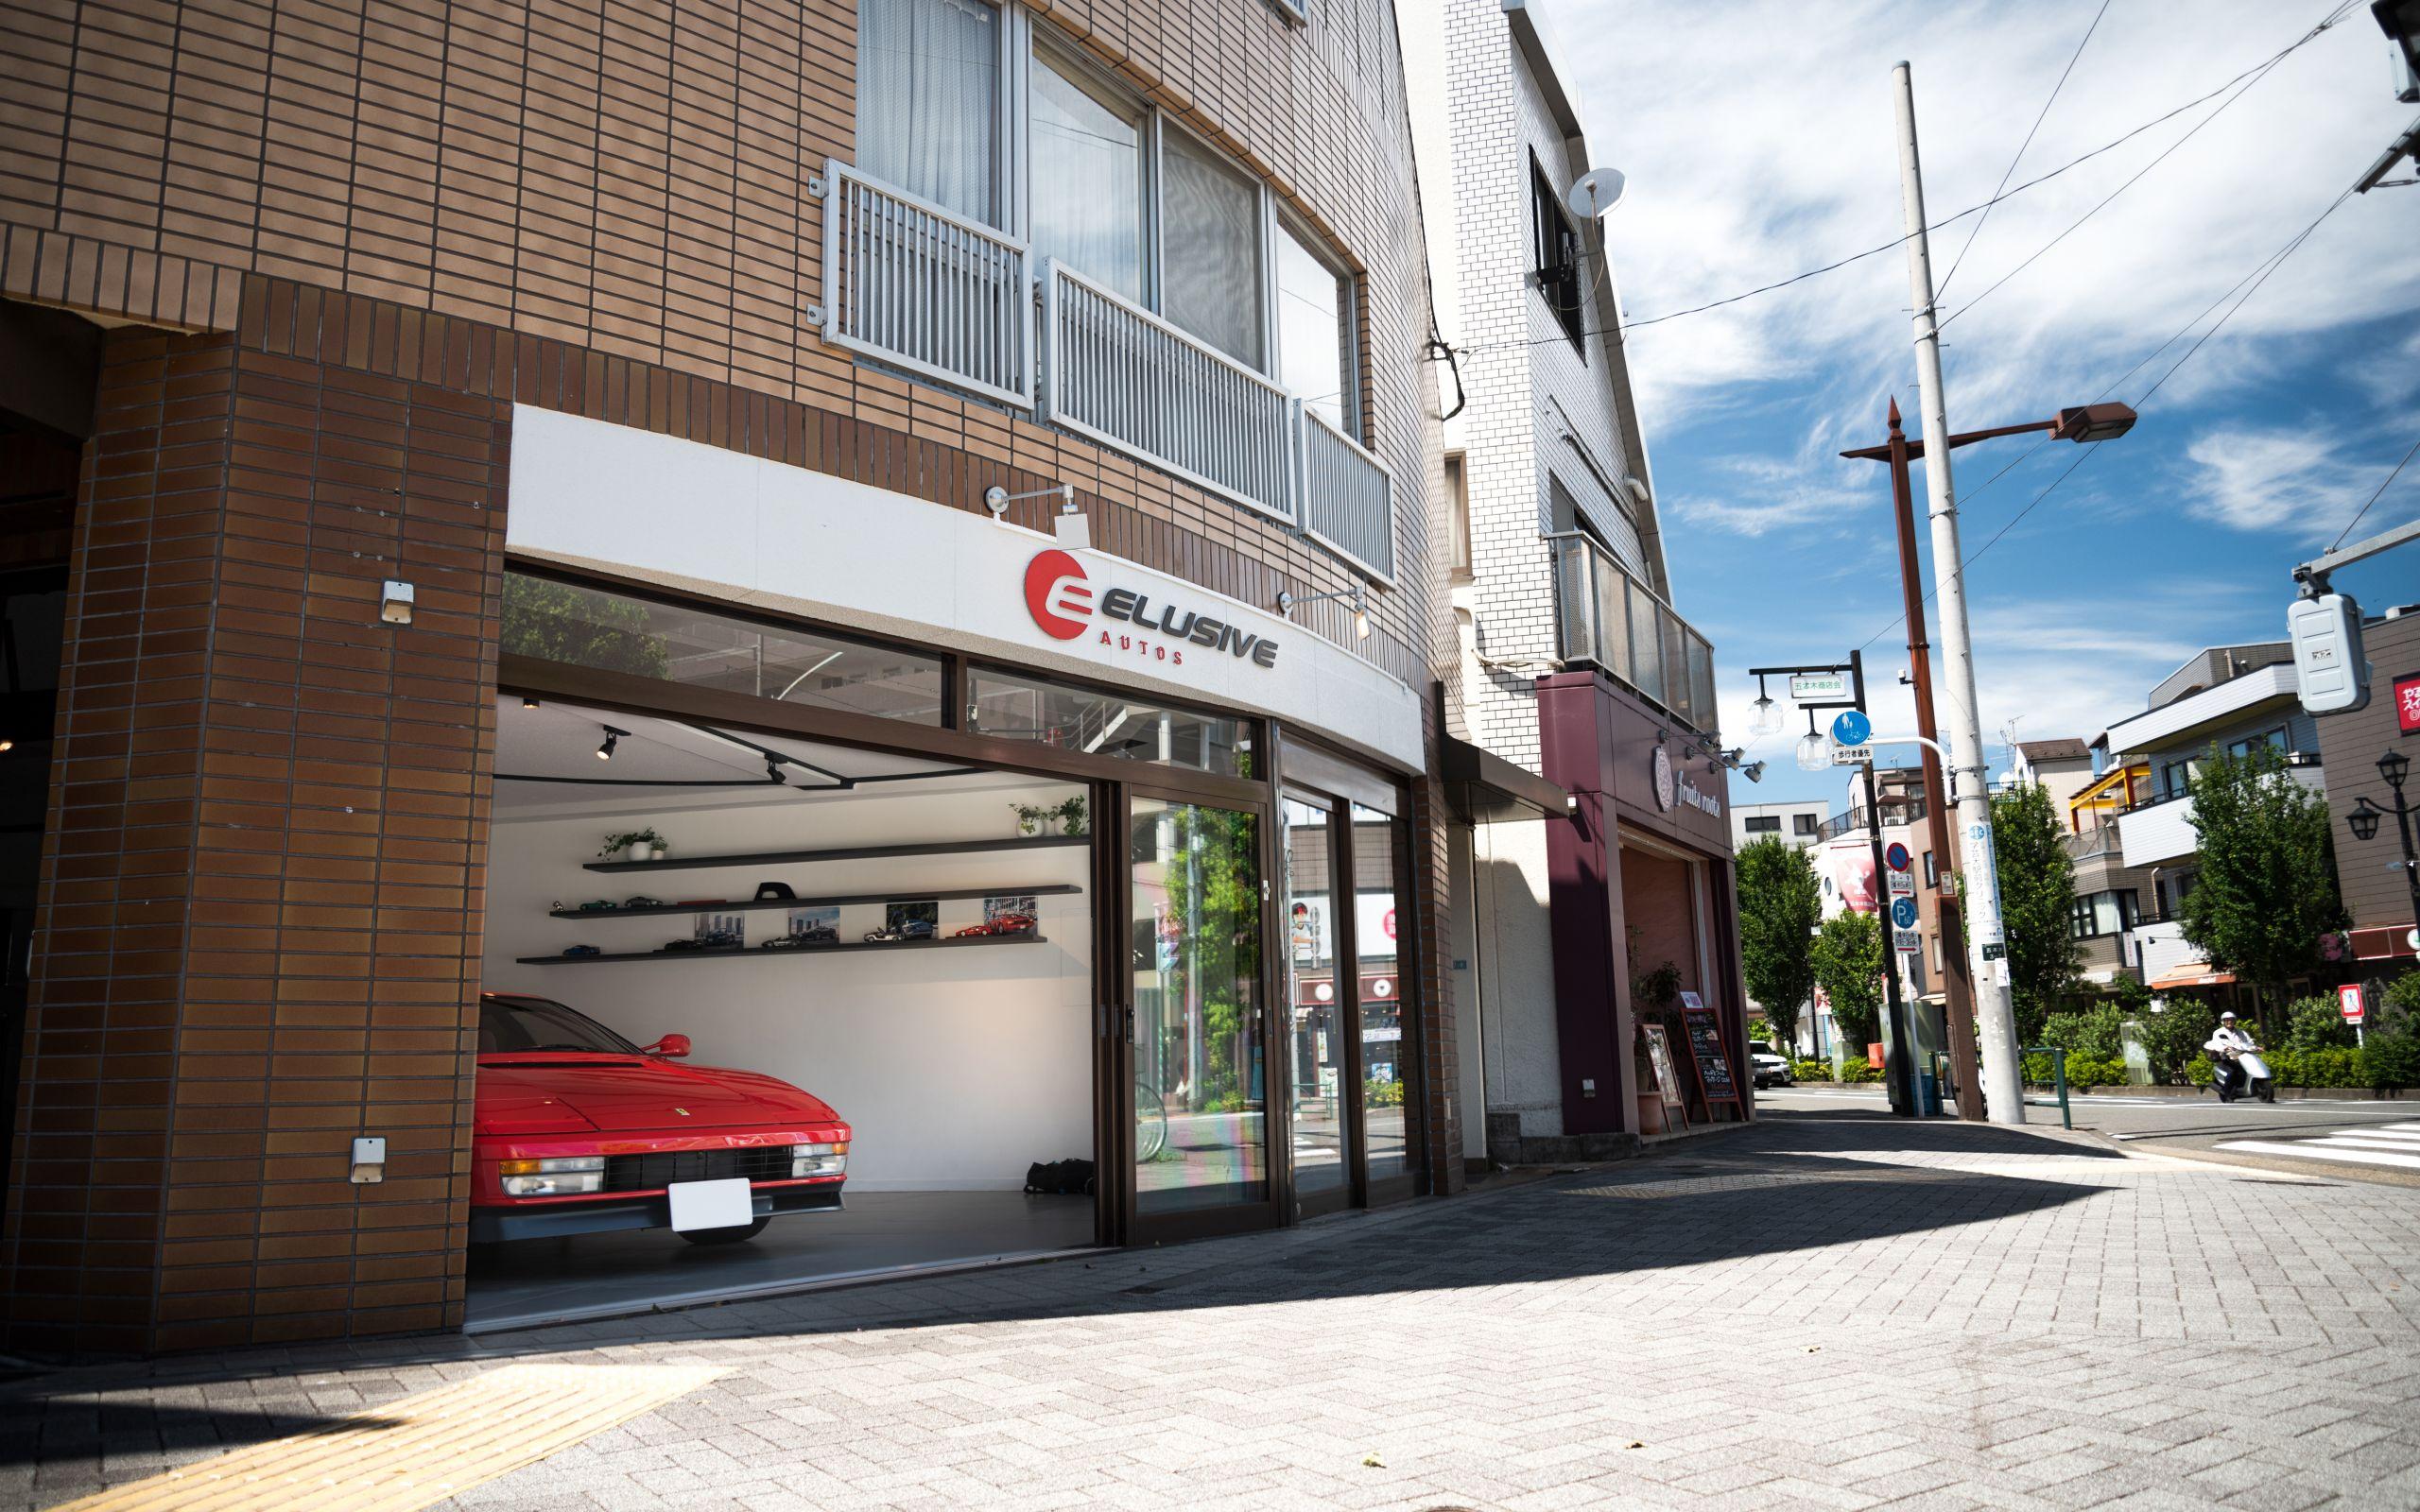 elusive autos meouro auto services provider bilingual showroom gakugeidaigaku rare cars sports cars